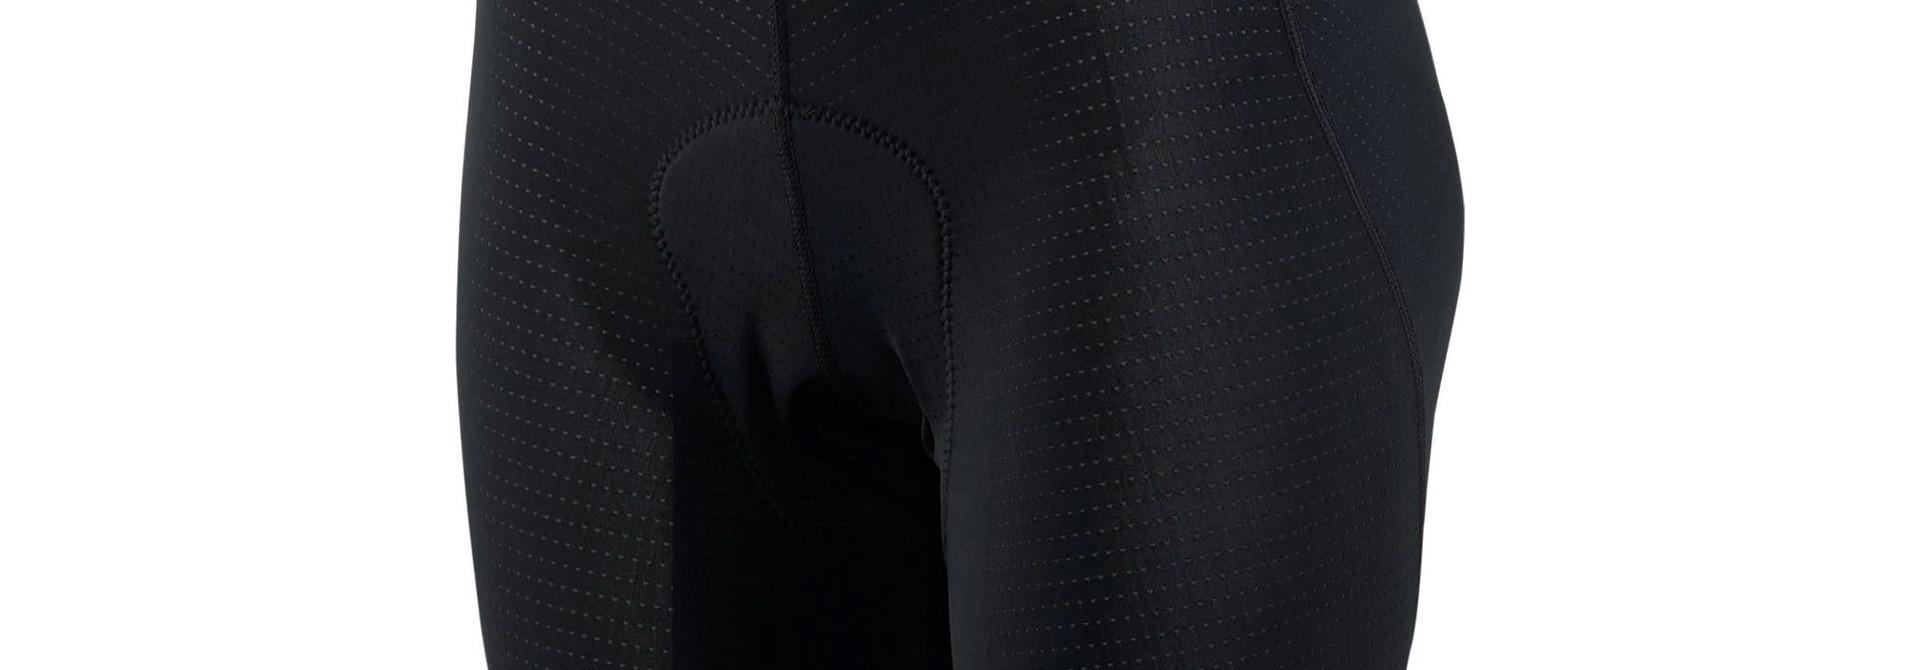 Crux Women's Liner Short Black